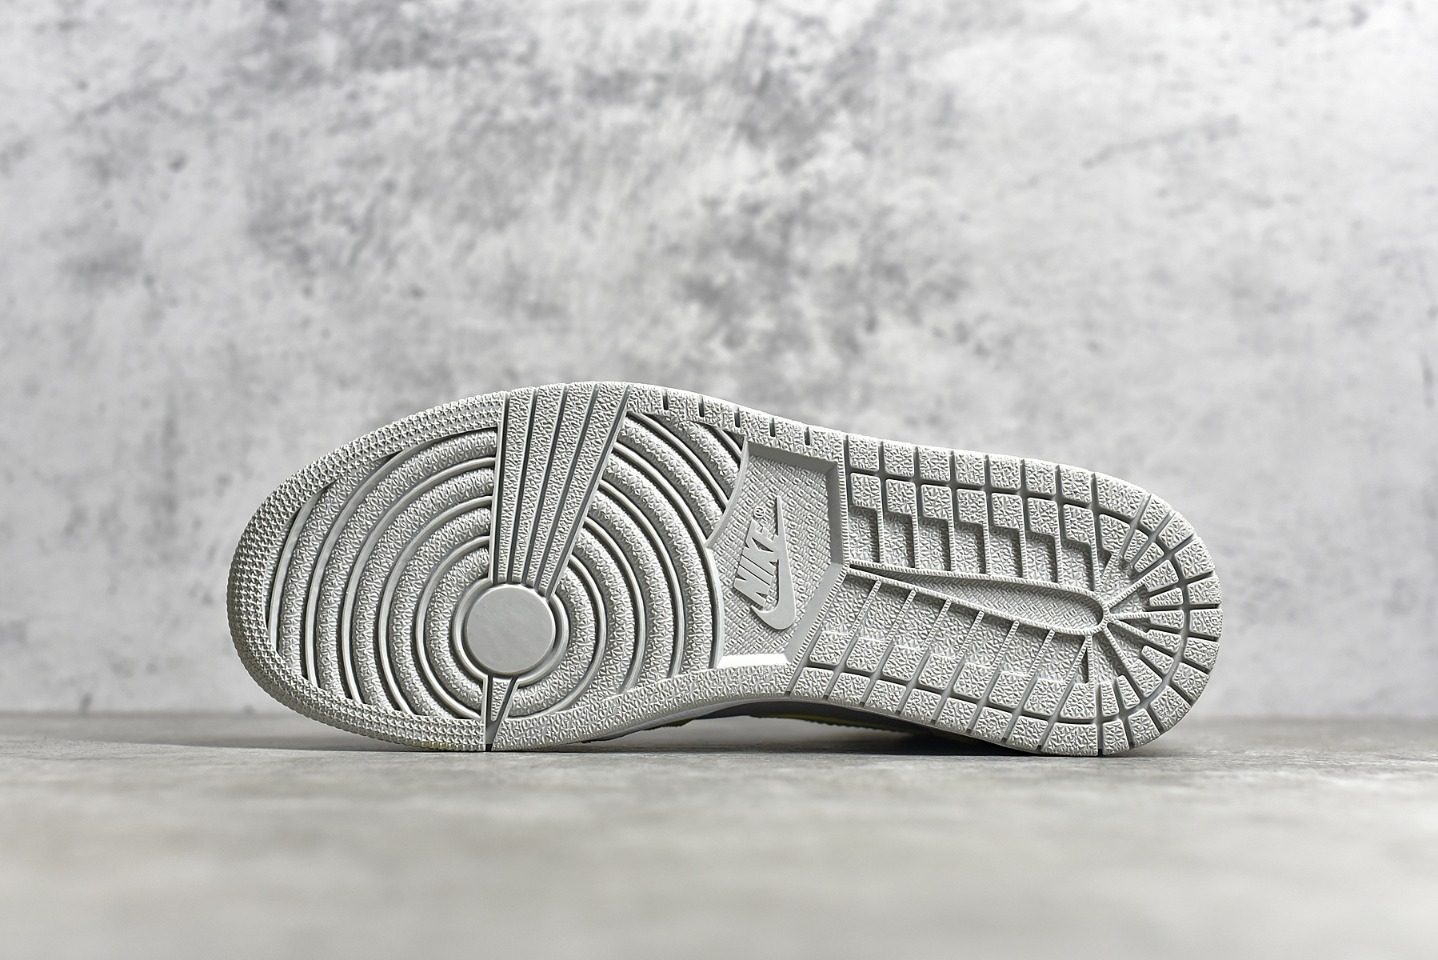 AJ1棕灰中帮鞋LC纯原版本 Air Jordan 1 Mid棕灰 AJ1麂皮灯芯绒材质搭配 货号:DA4666-001-潮流者之家